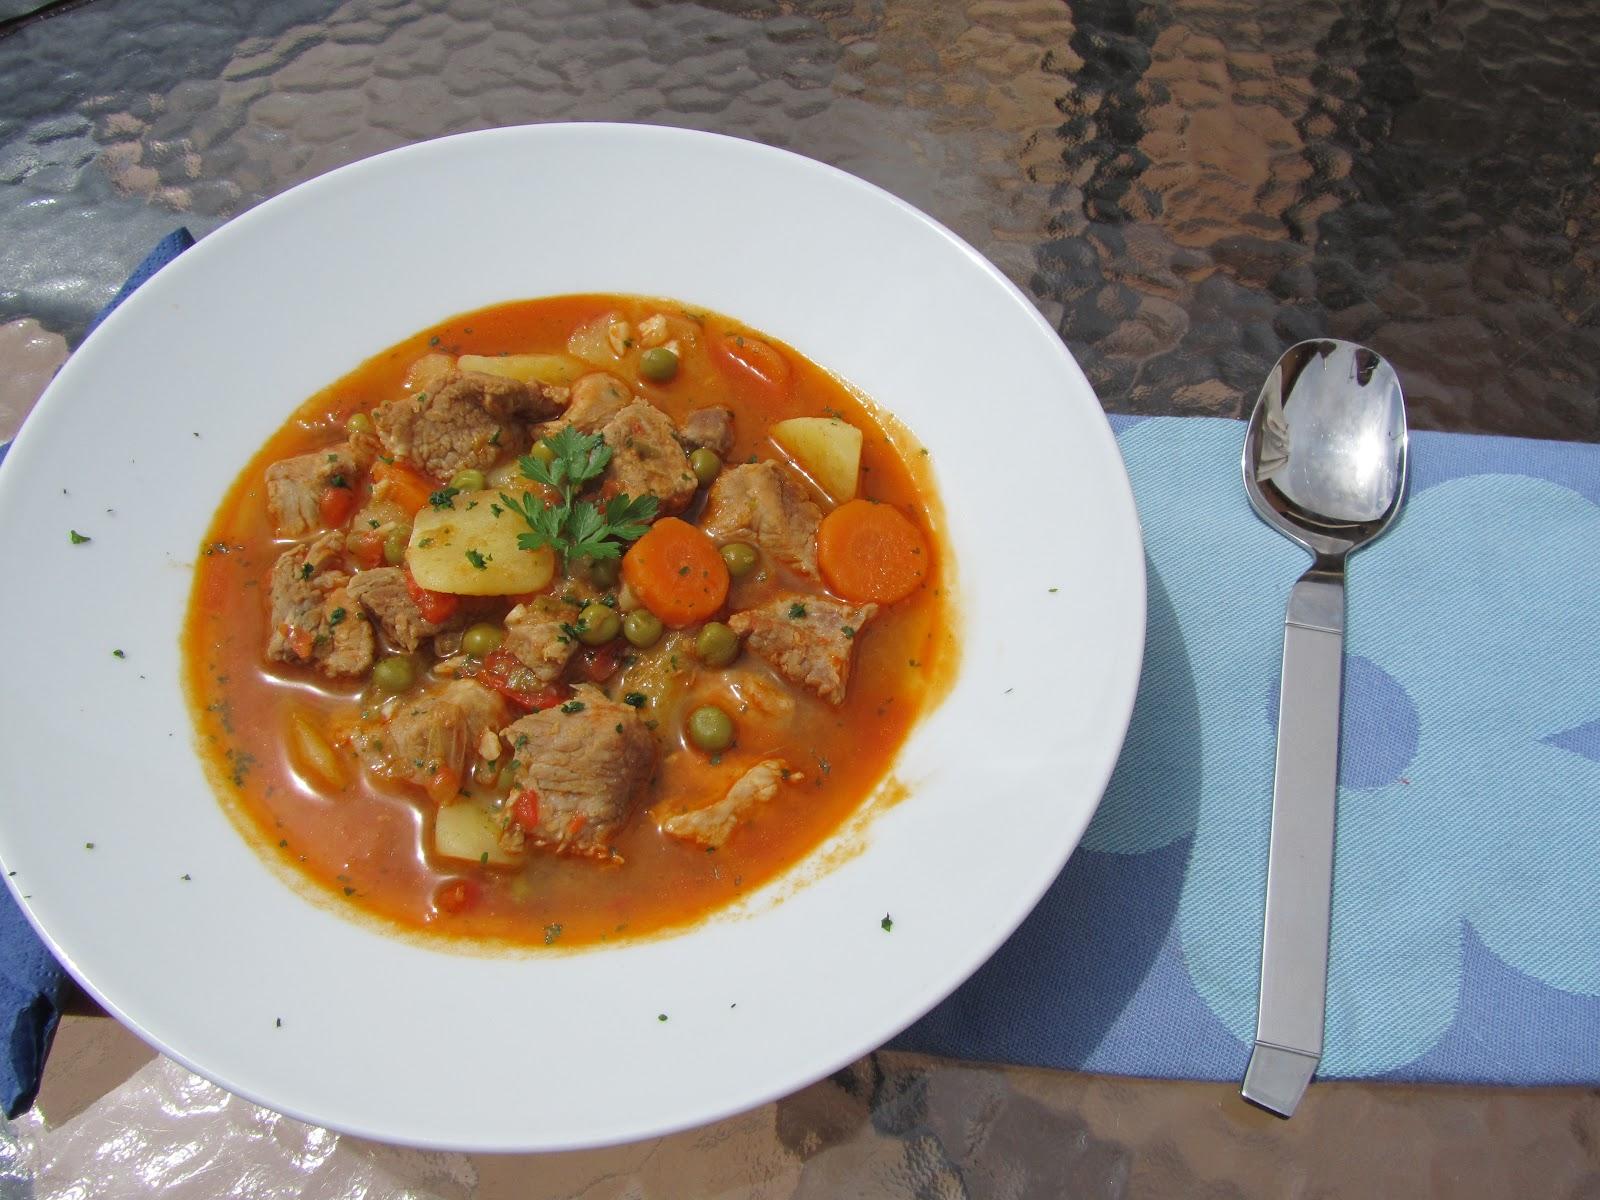 Estofado de cerdo con verduras thermomix - Guiso de carne de cerdo ...